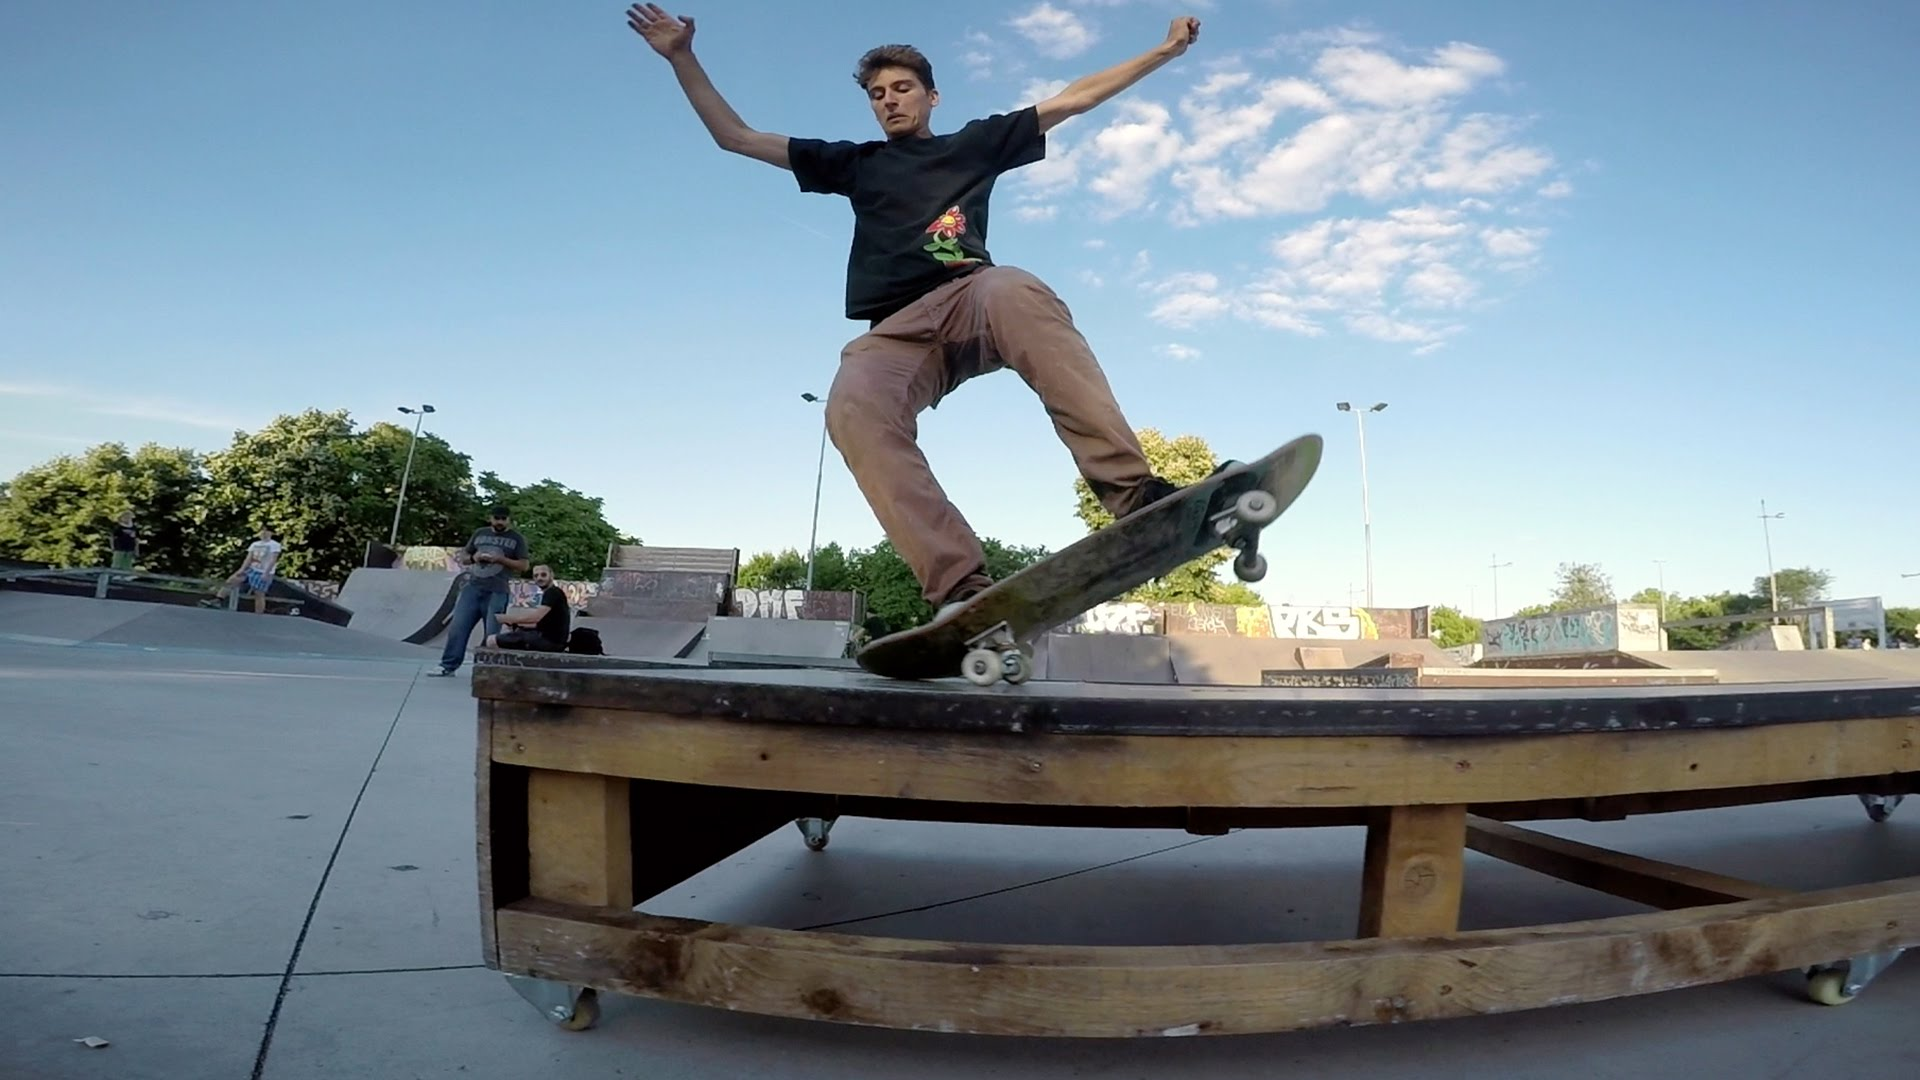 Belgrade Skateboarding Crew